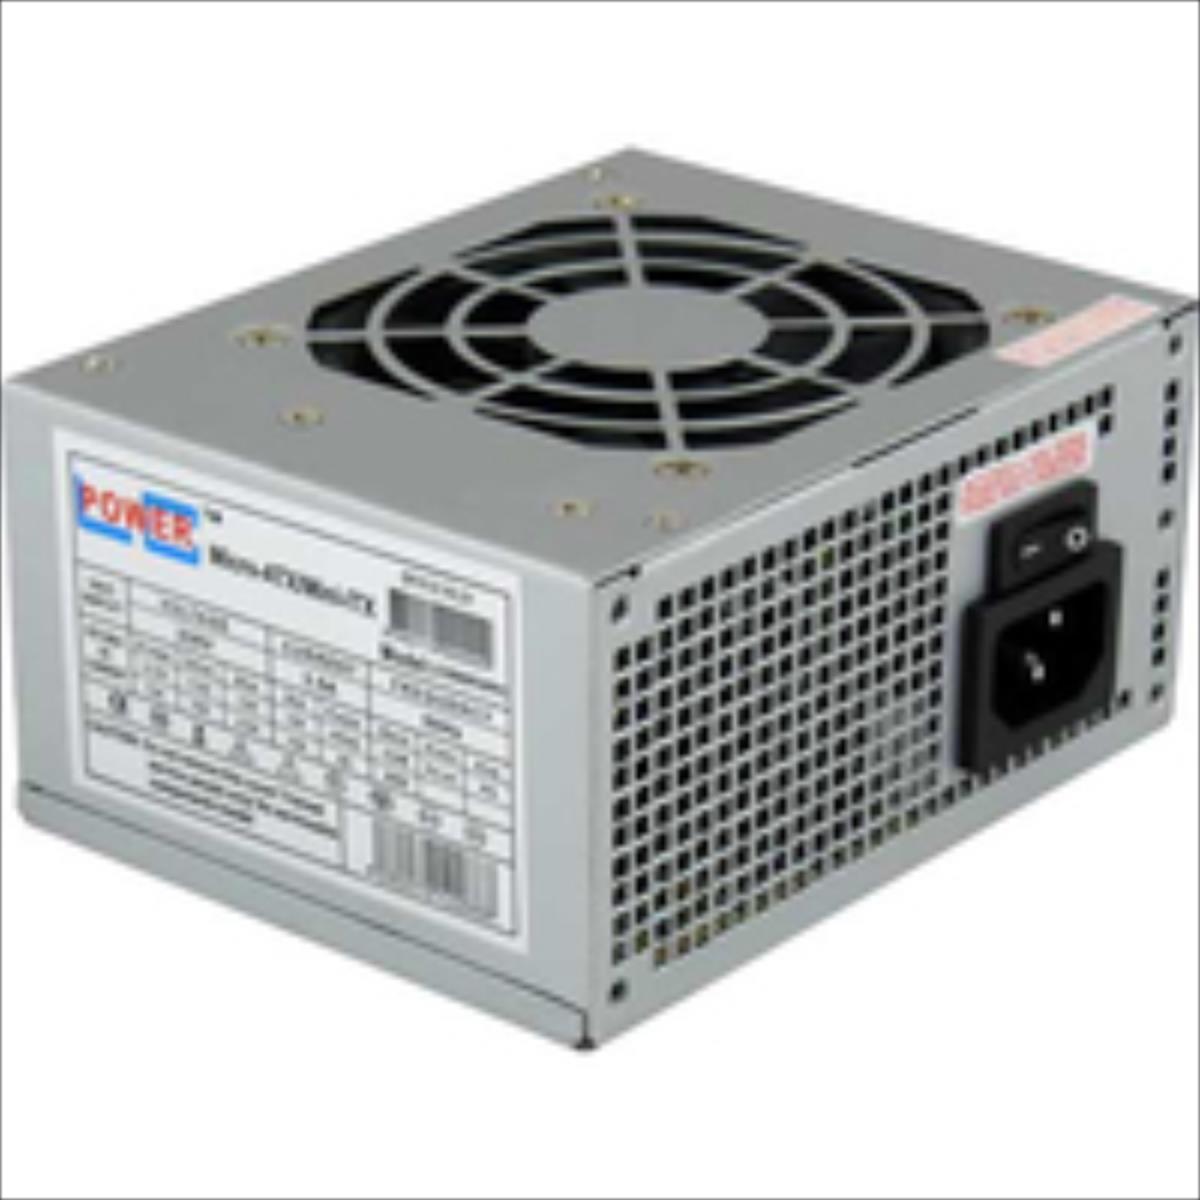 Netzteil LC-Power 300W SFX 8cm LC300SFX (80+Bronze) Barošanas bloks, PSU